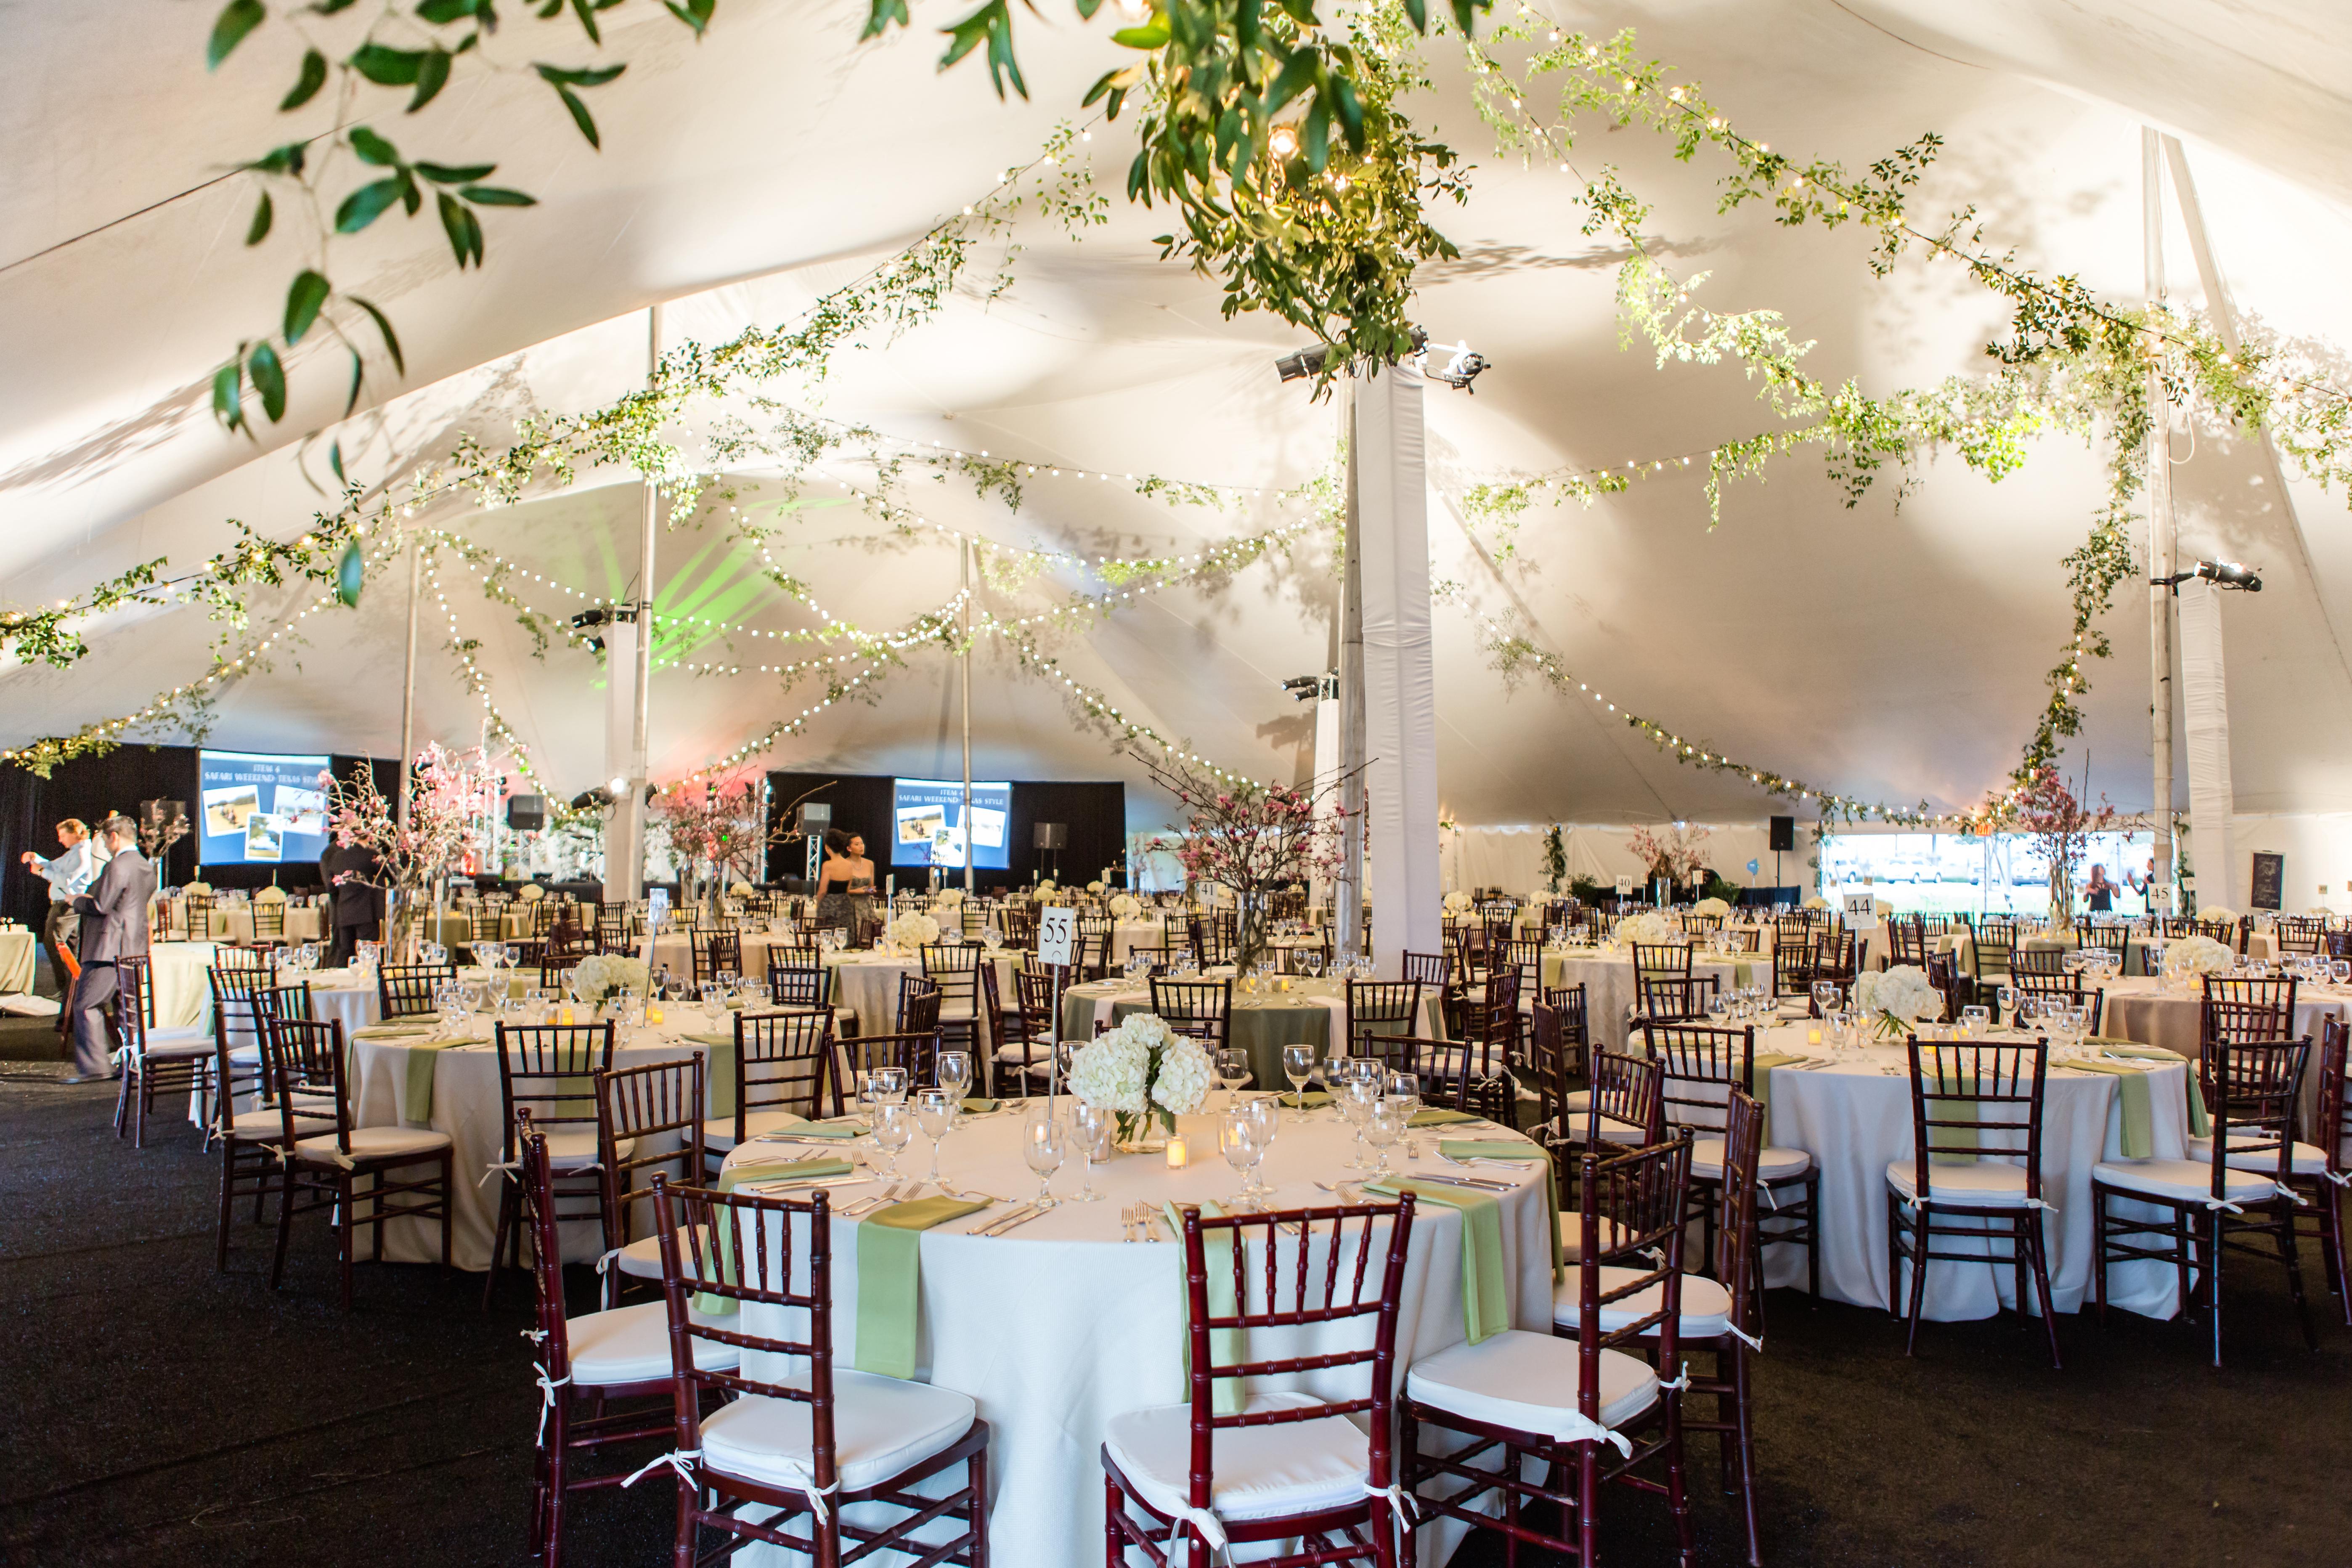 Inside Pole Tent Rental with Elegant Decor